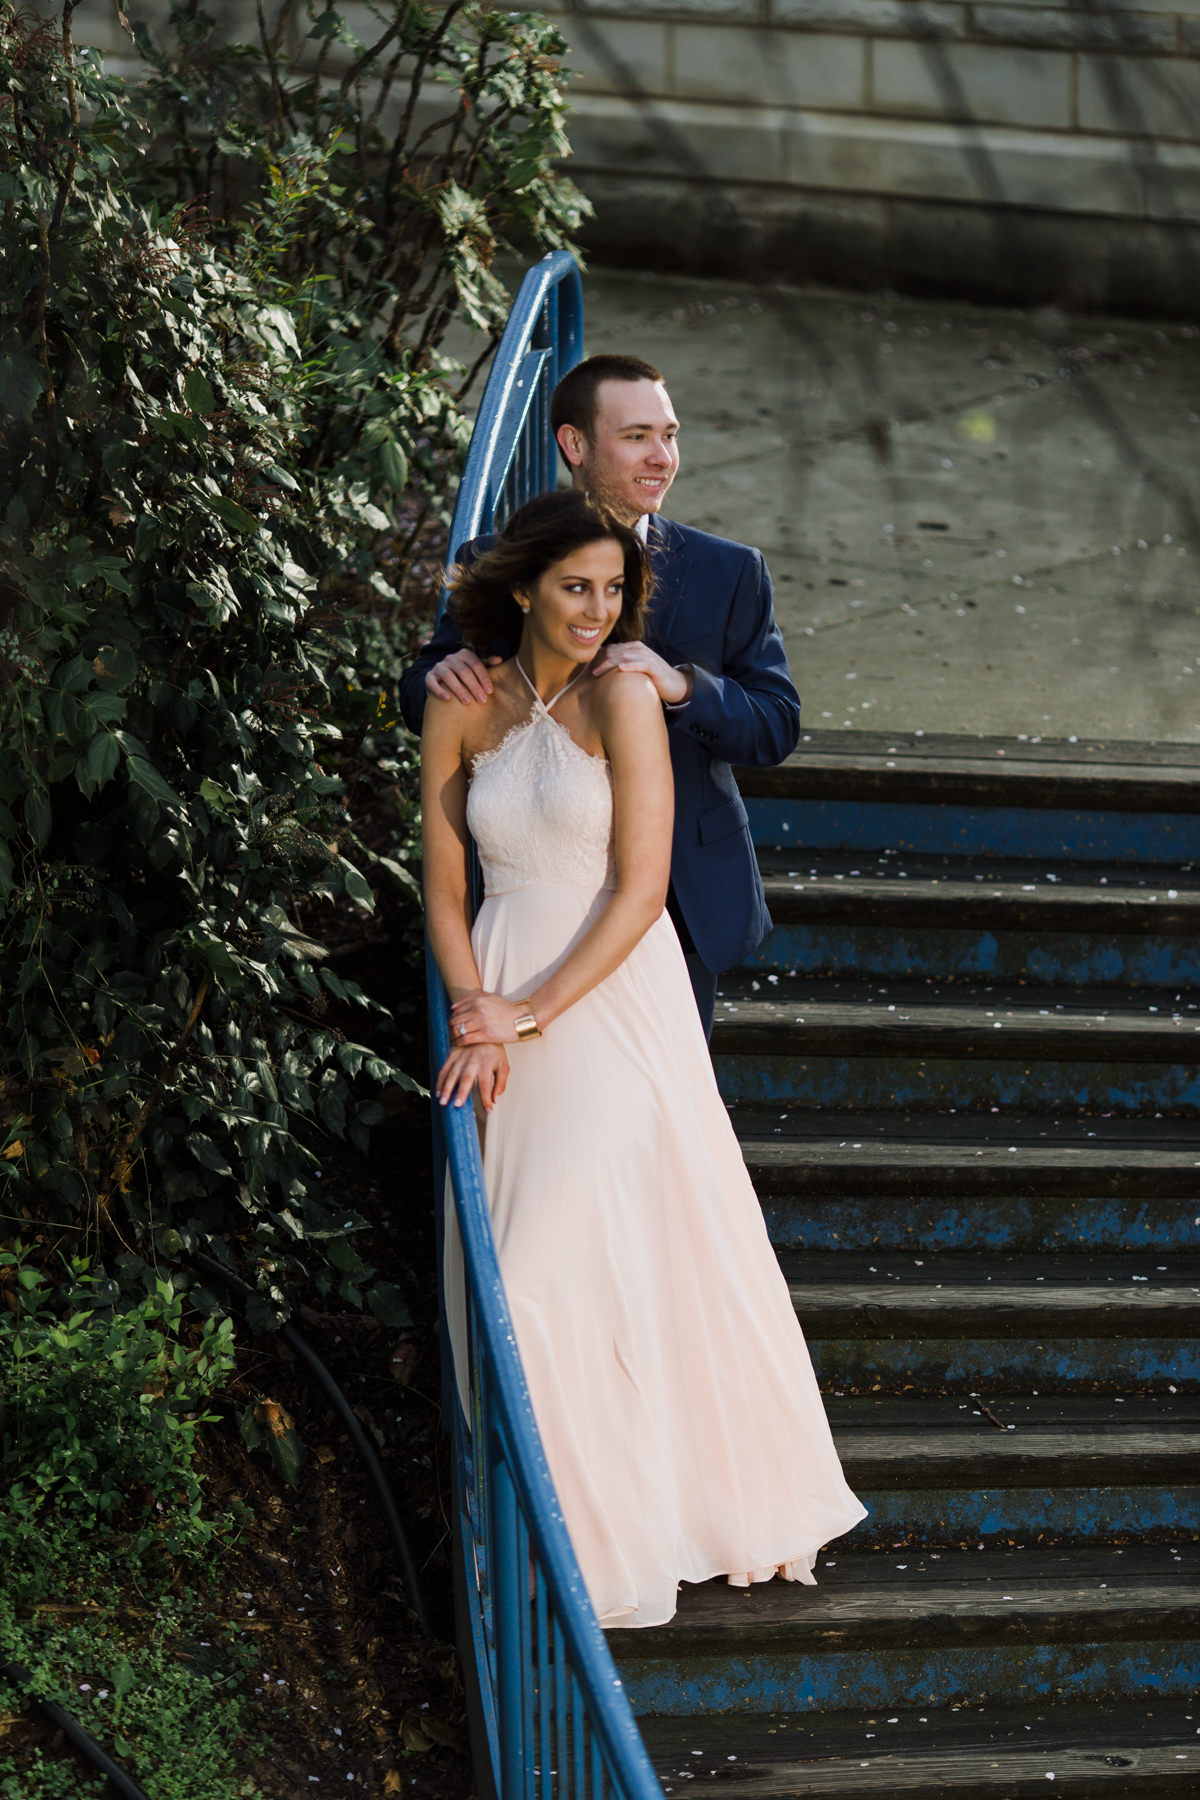 Katelyn and Zachary Engagement-6.jpg